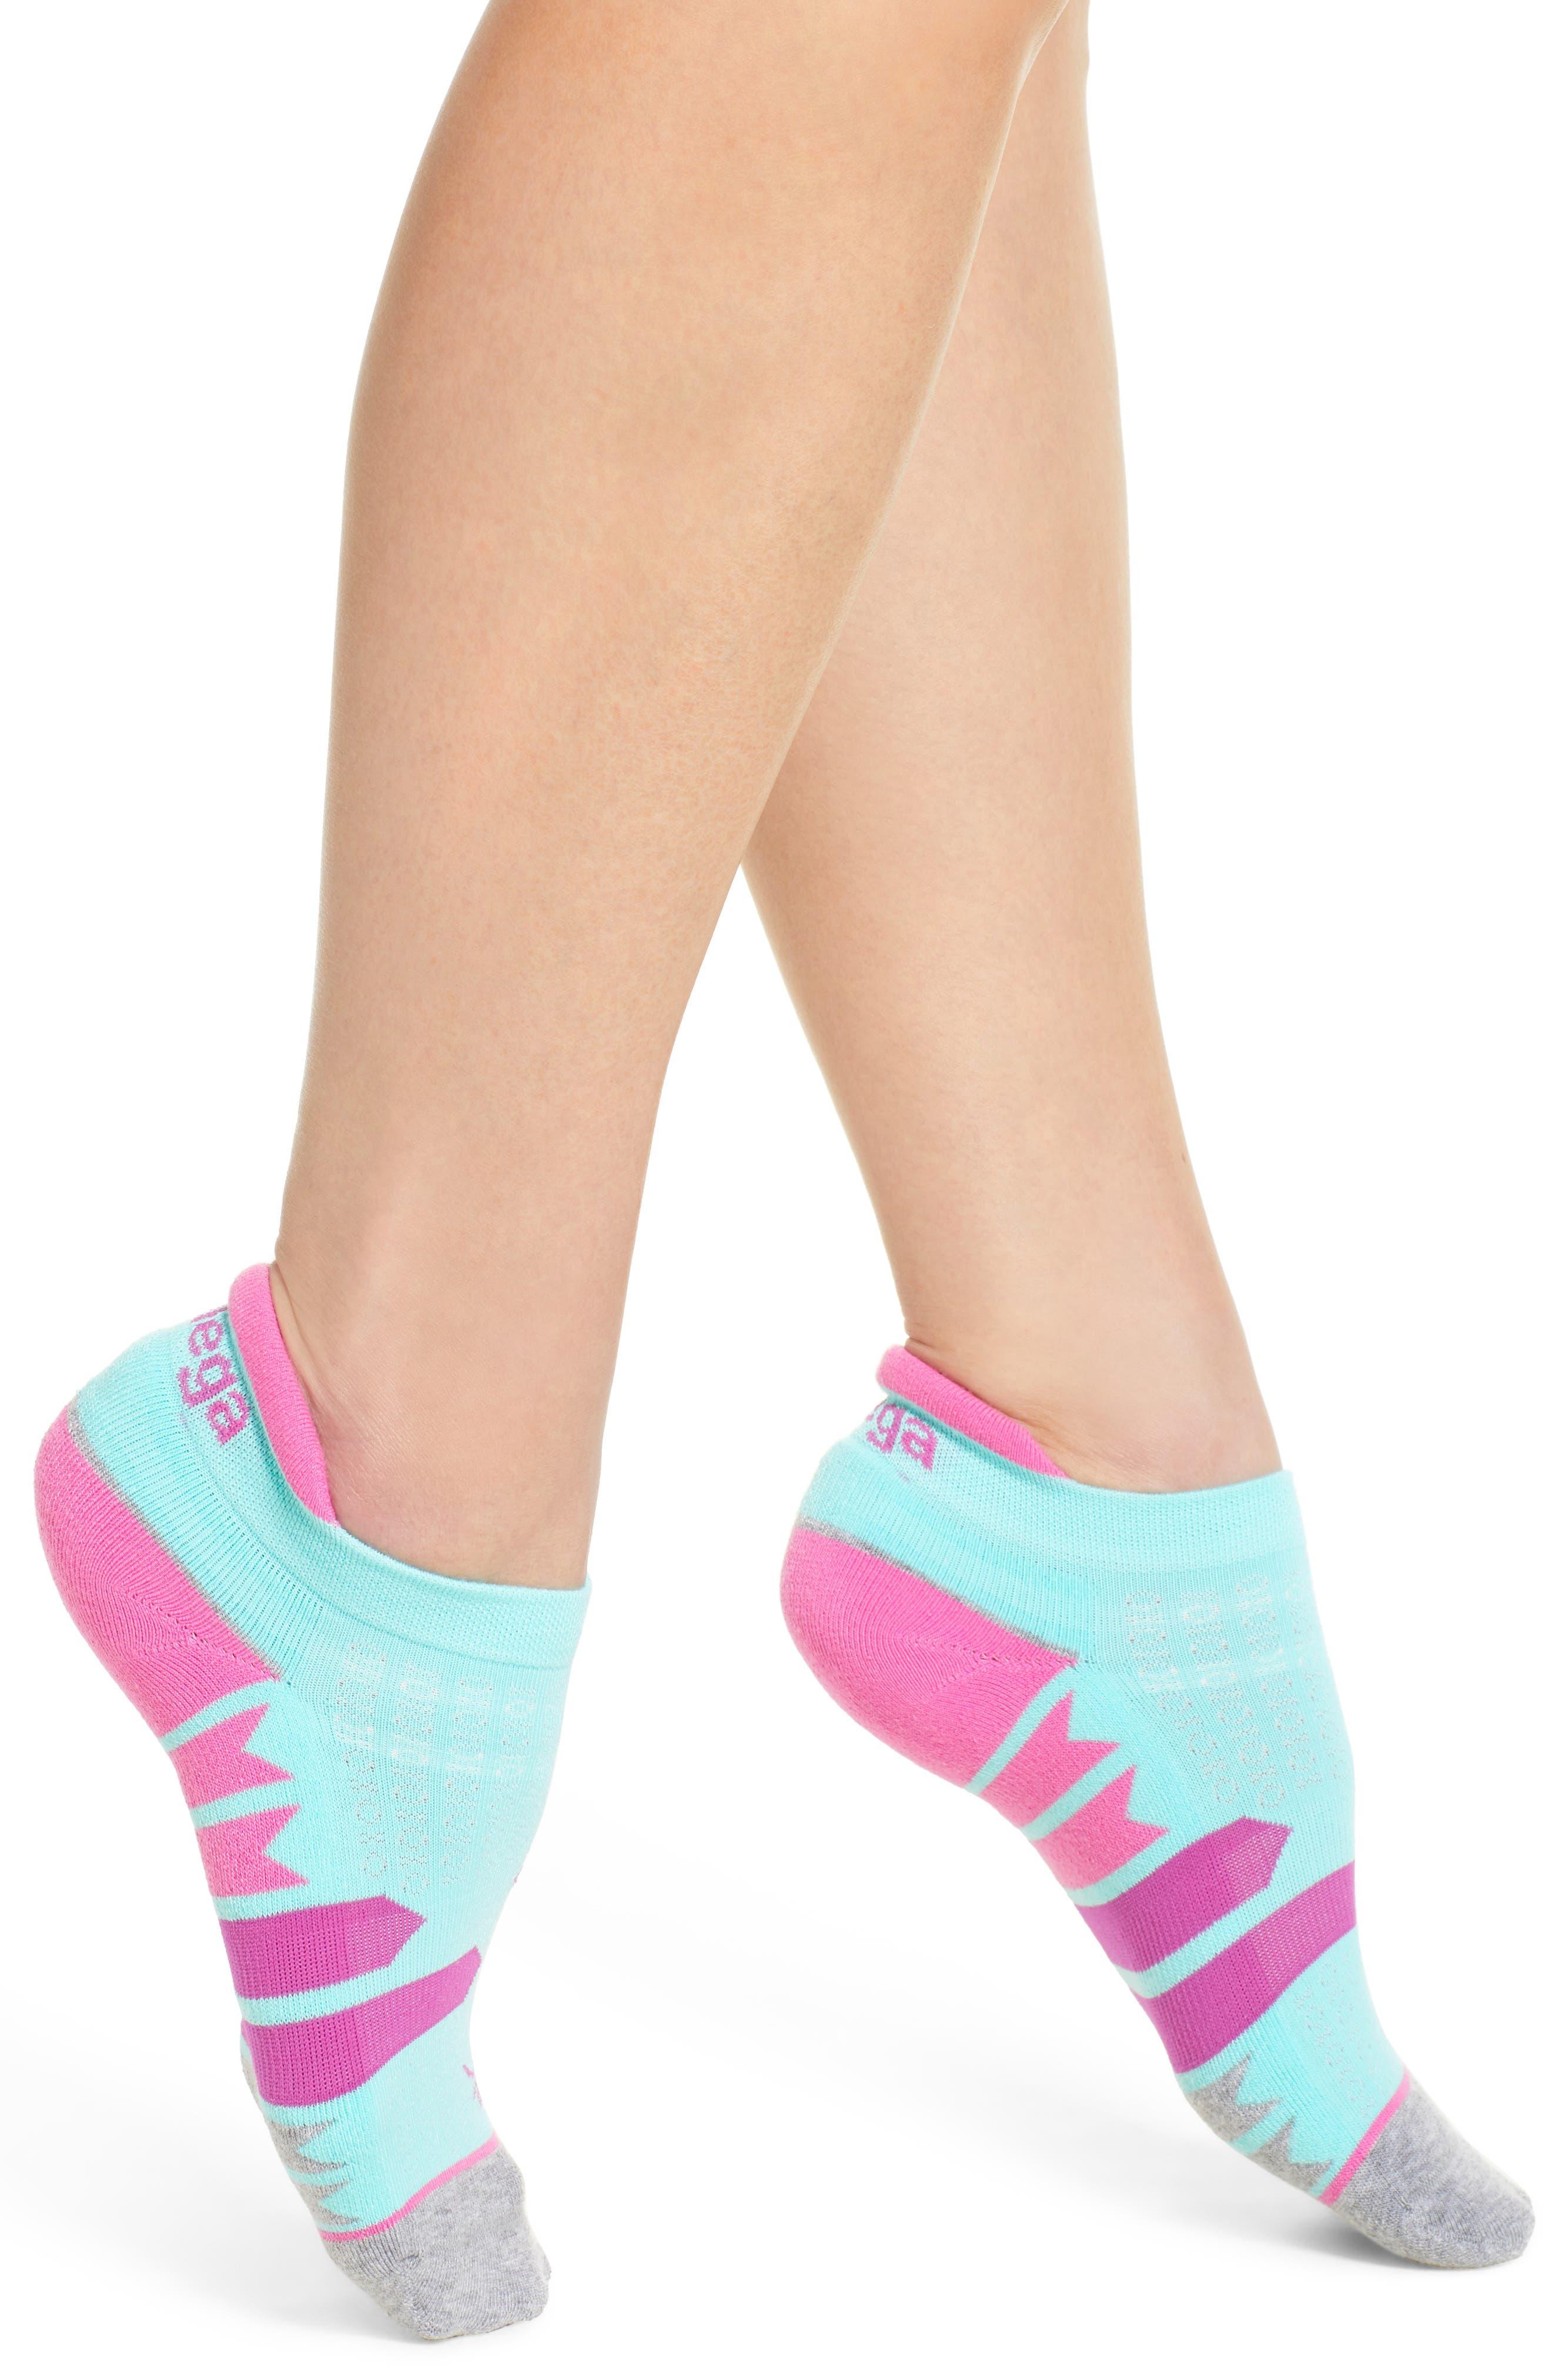 Enduro No-Show Running Socks,                         Main,                         color, 400